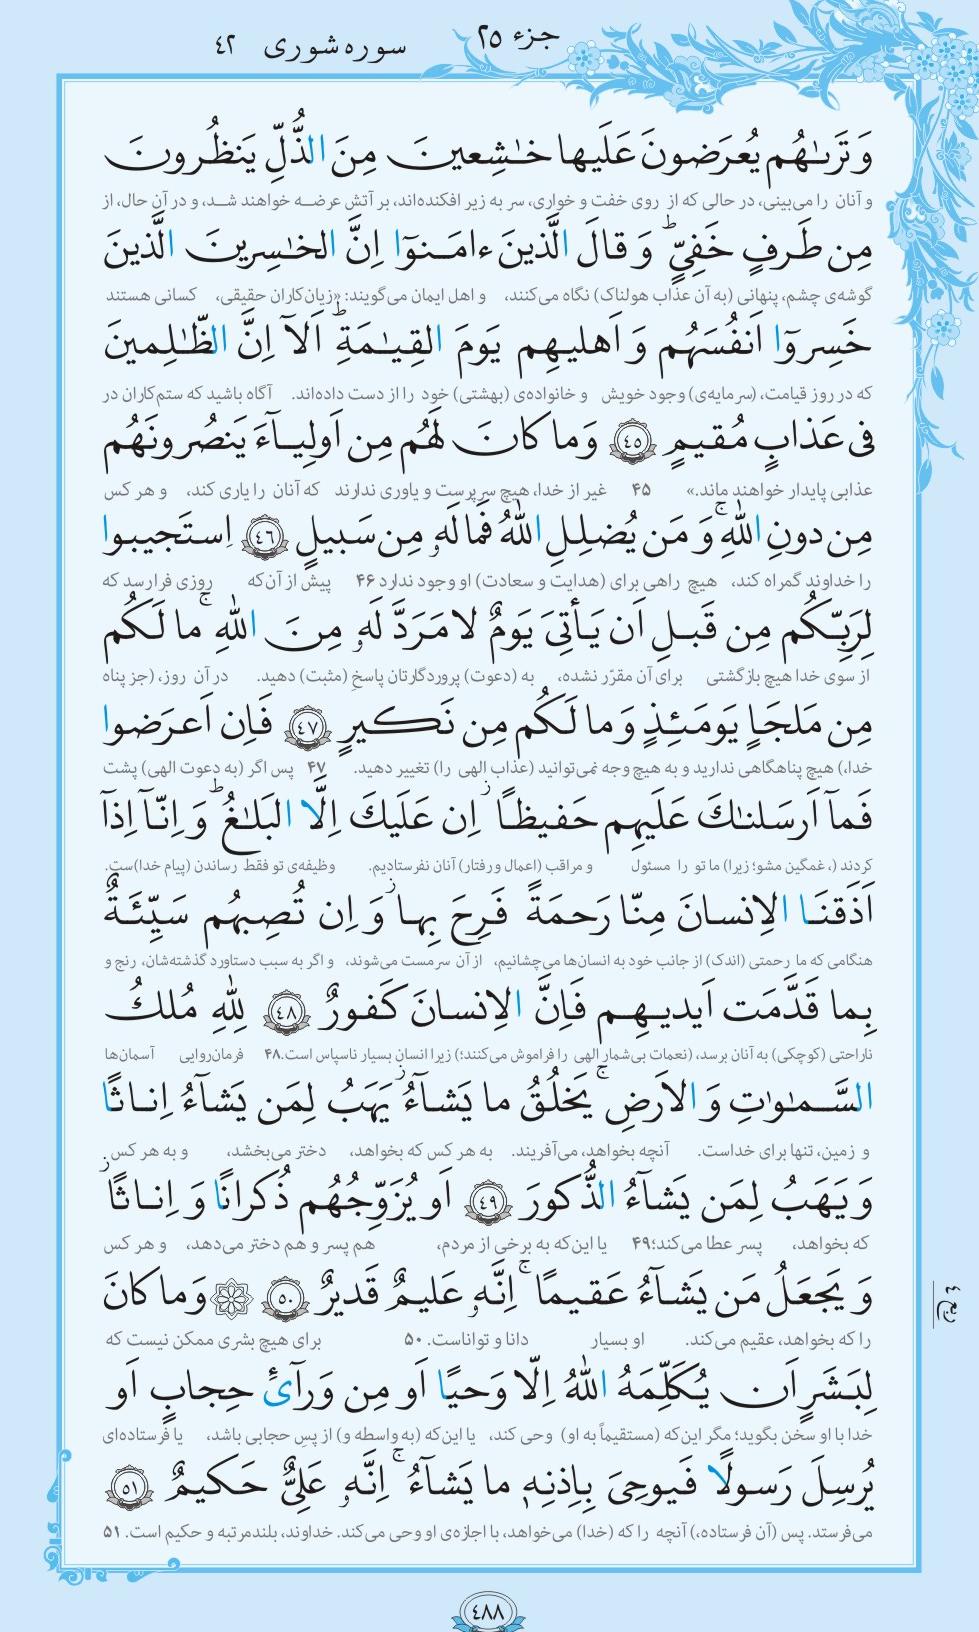 13990626000853 Test NewPhotoFree - ترتیل صفحه ۴۸۸ قرآن کریم+فیلم و متن آیات